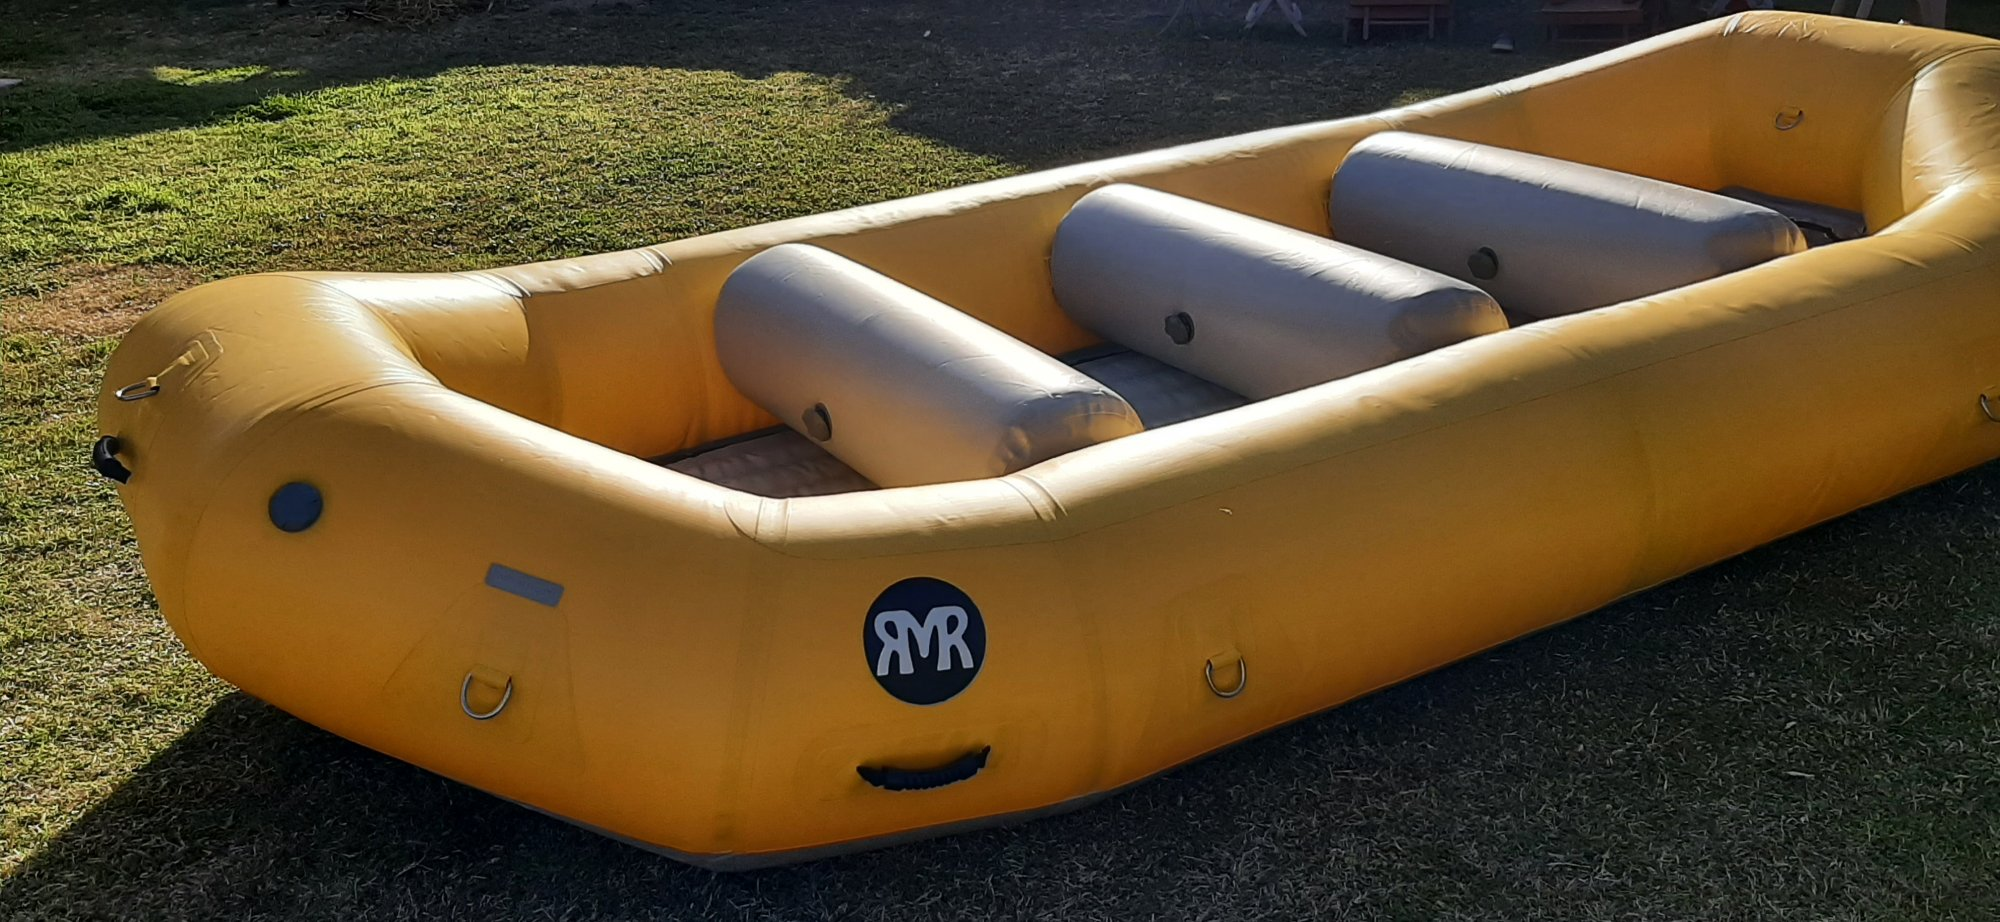 RMR SB 140 14' self bailing raft - Used Demo